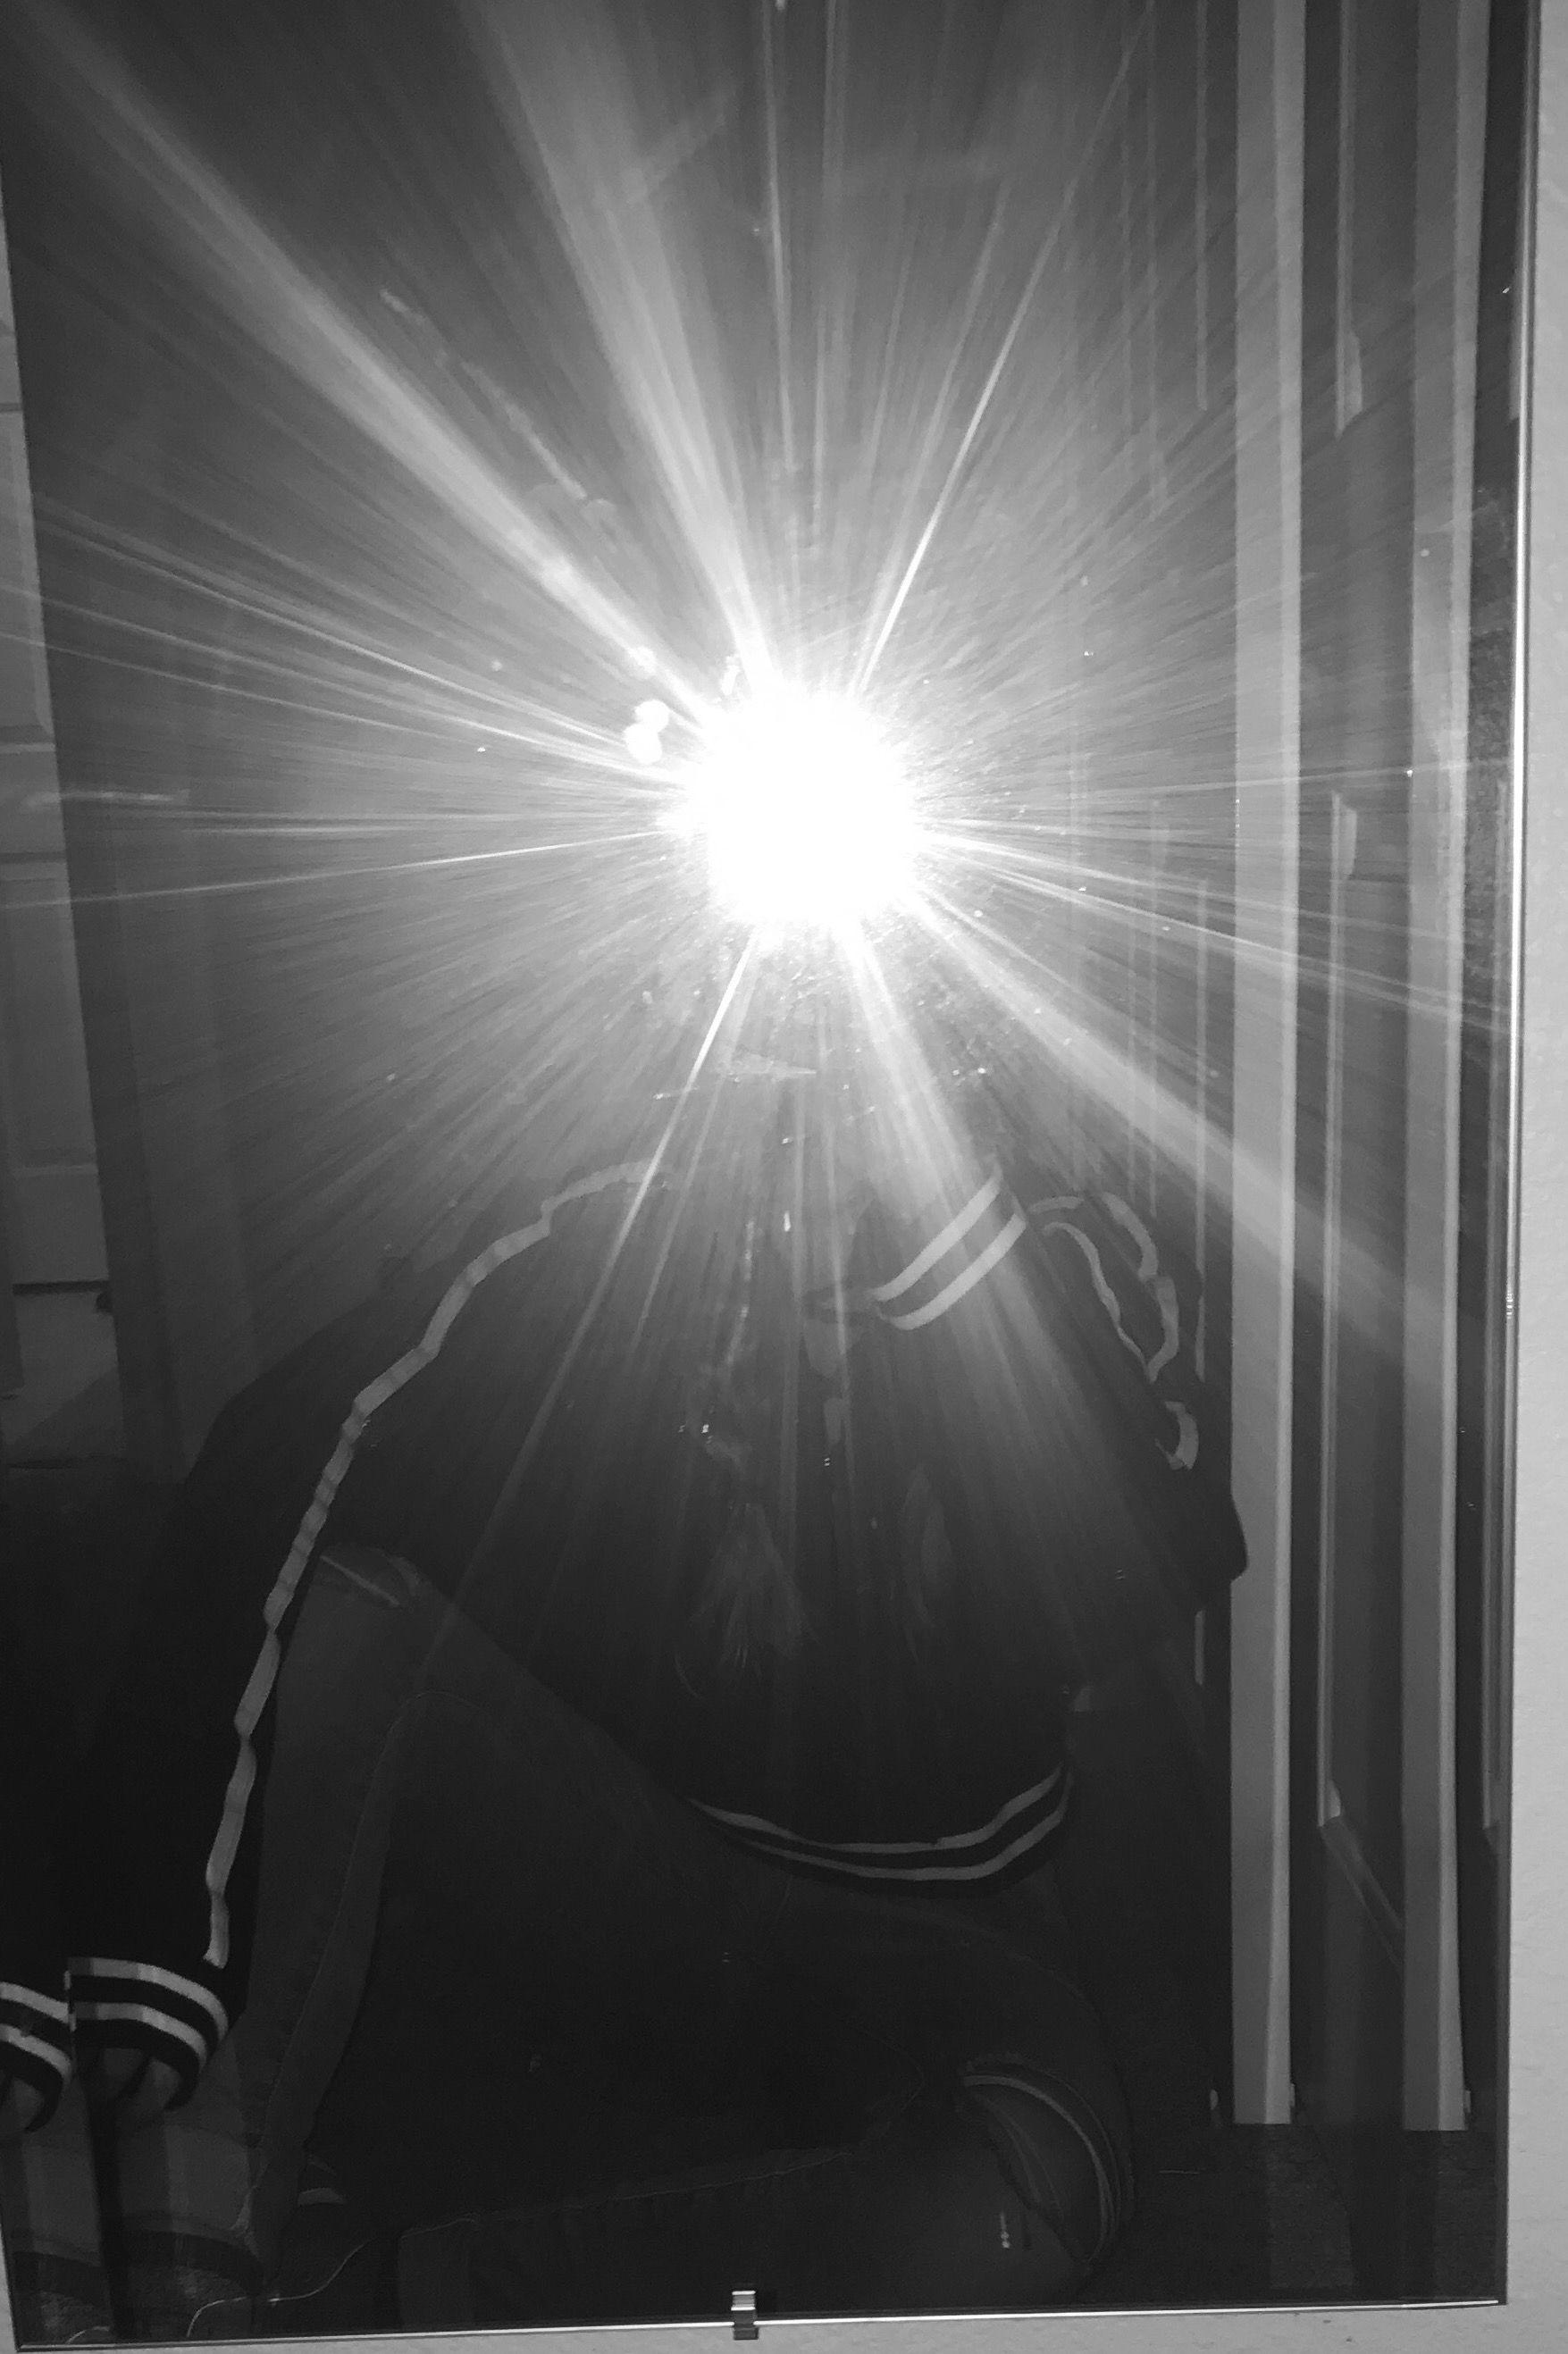 Aesthetic Mirror Selfie Boy